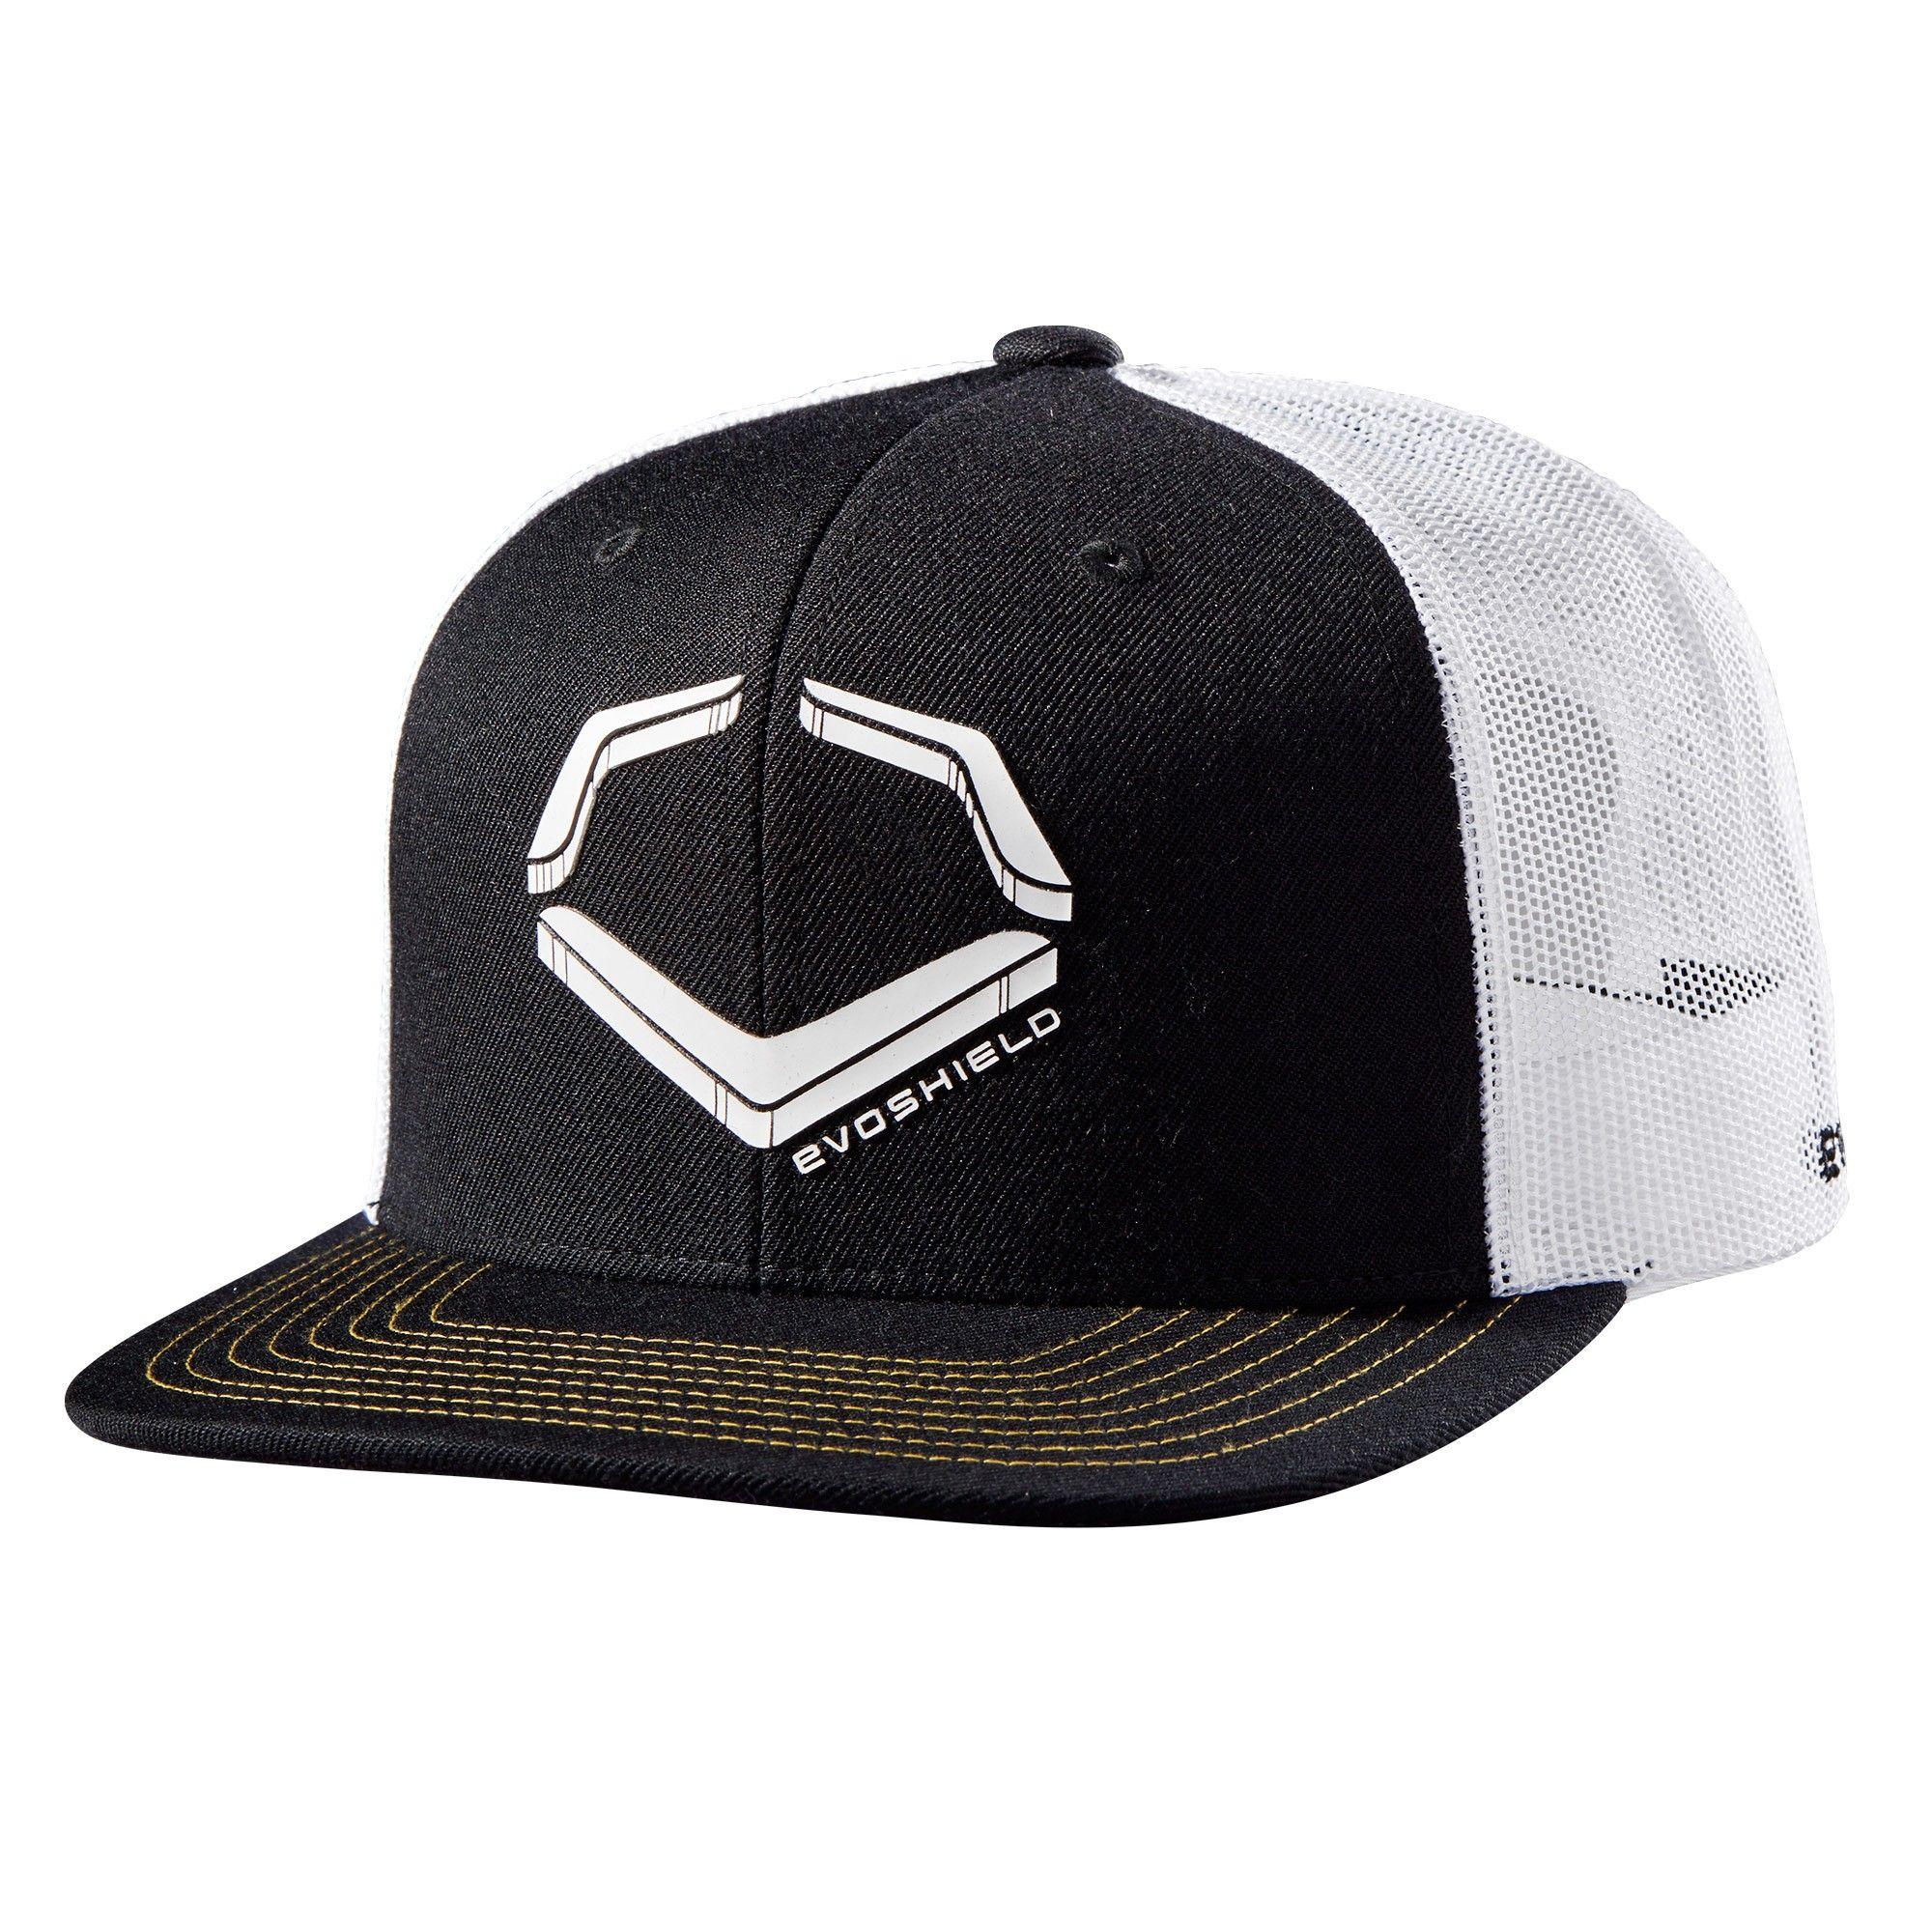 724ccd00 Evoshield Crunch Snapback Baseball/Softball Hat - Black/White in ...